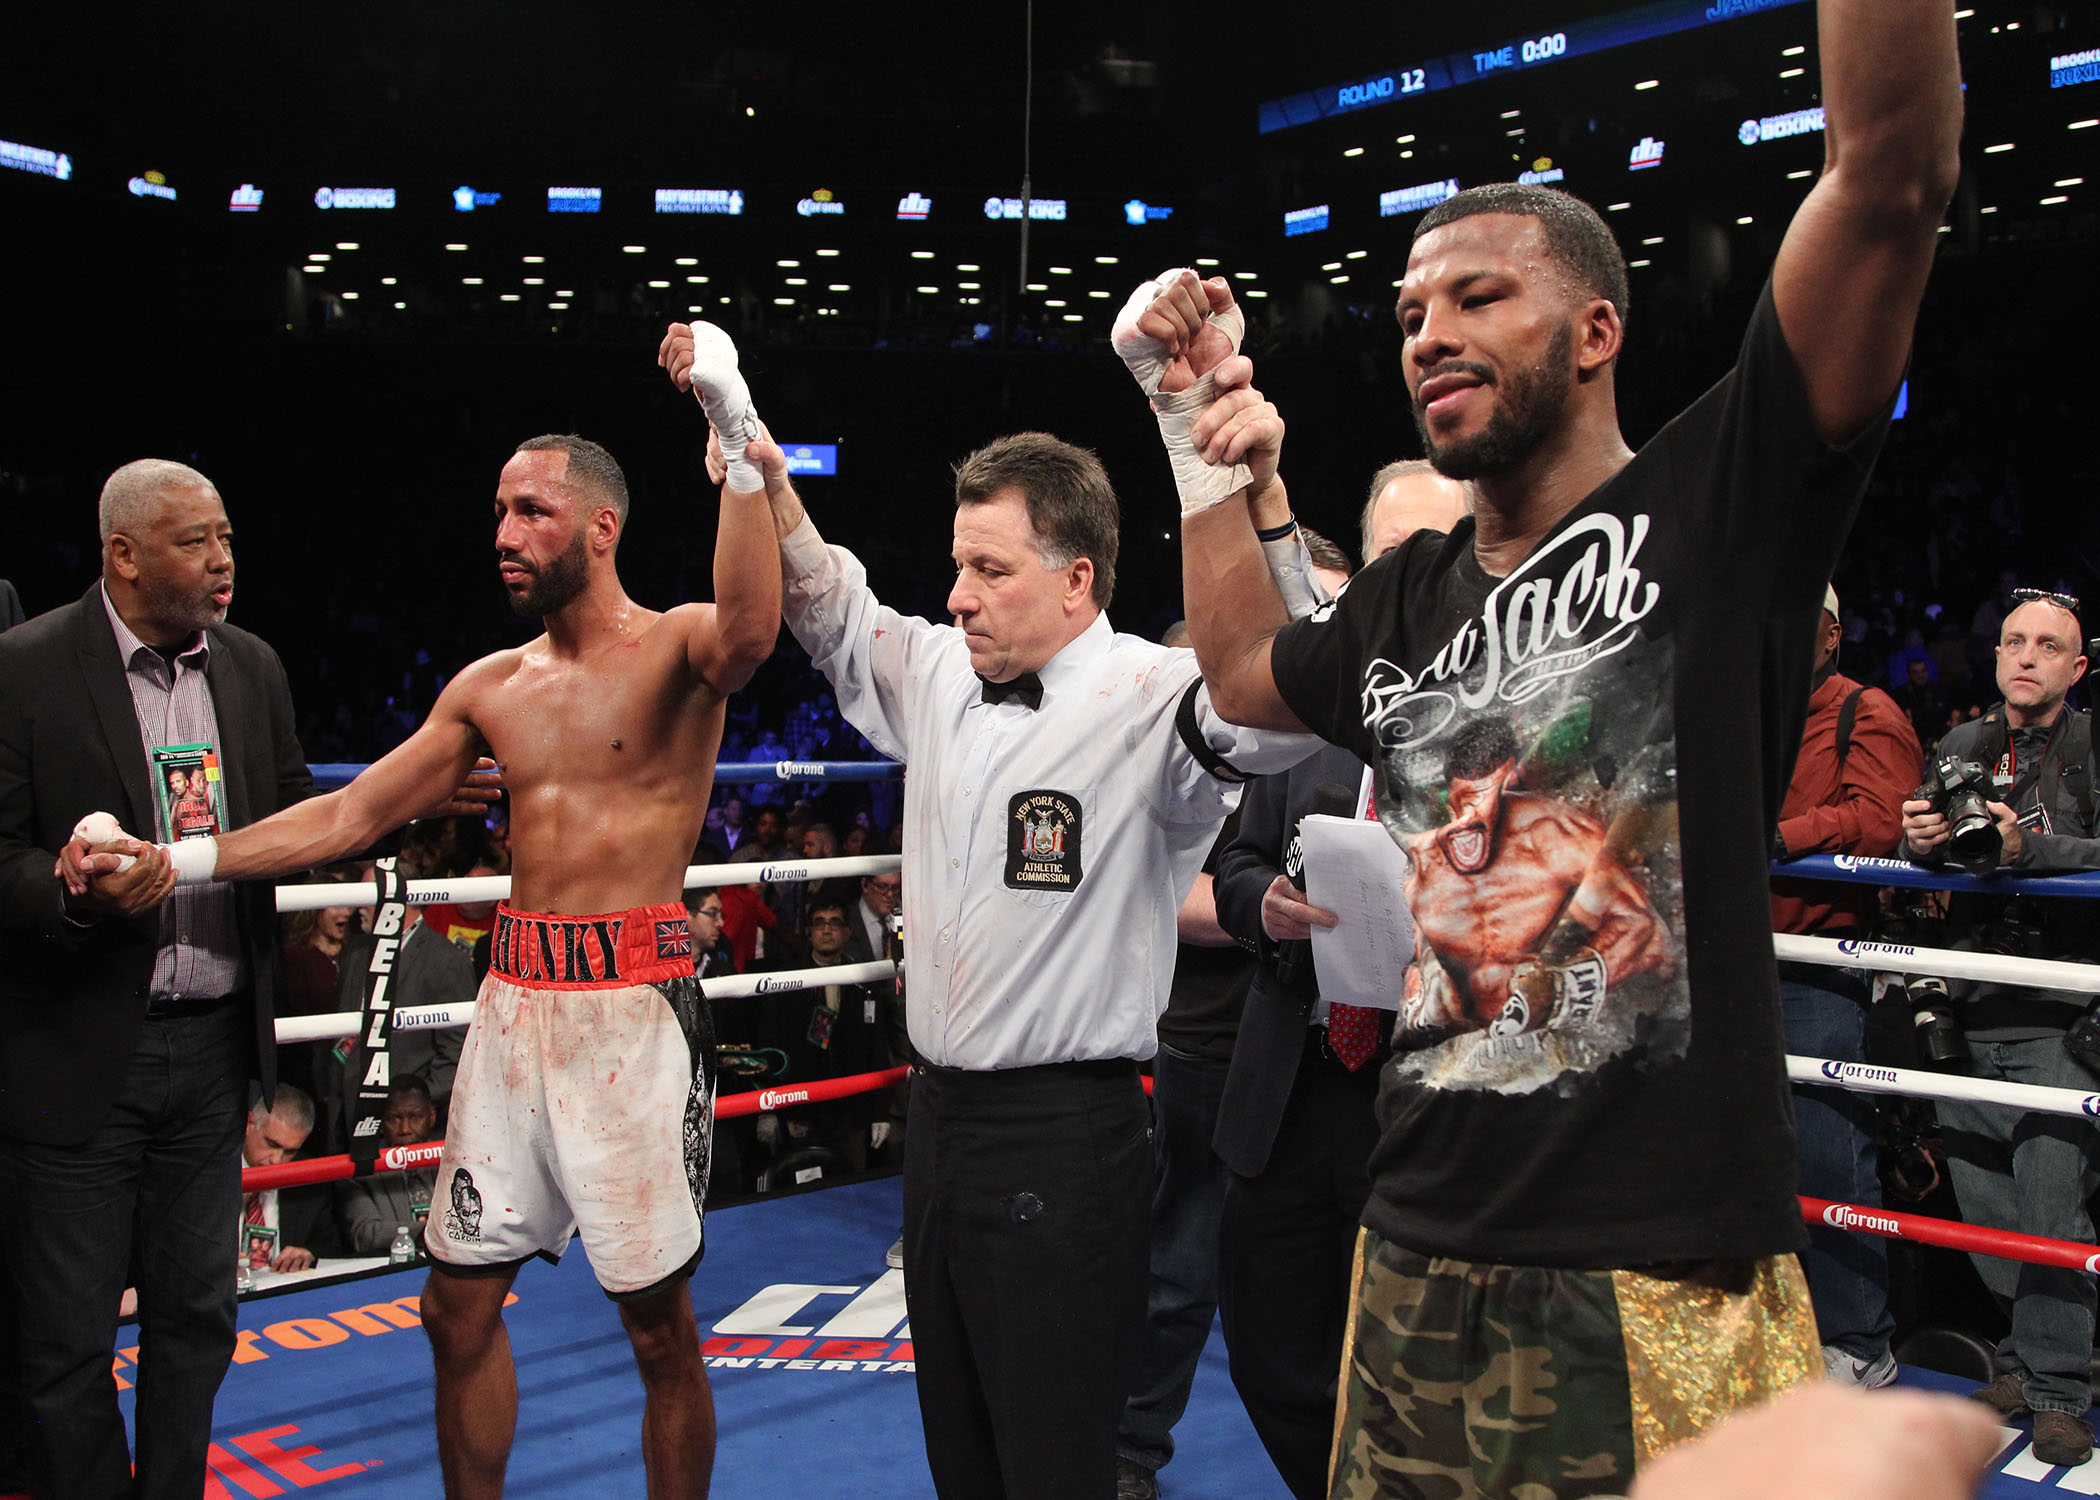 Boxing_ShowtimeBoxing_JamesDeGale_BadouJack_2017_011417